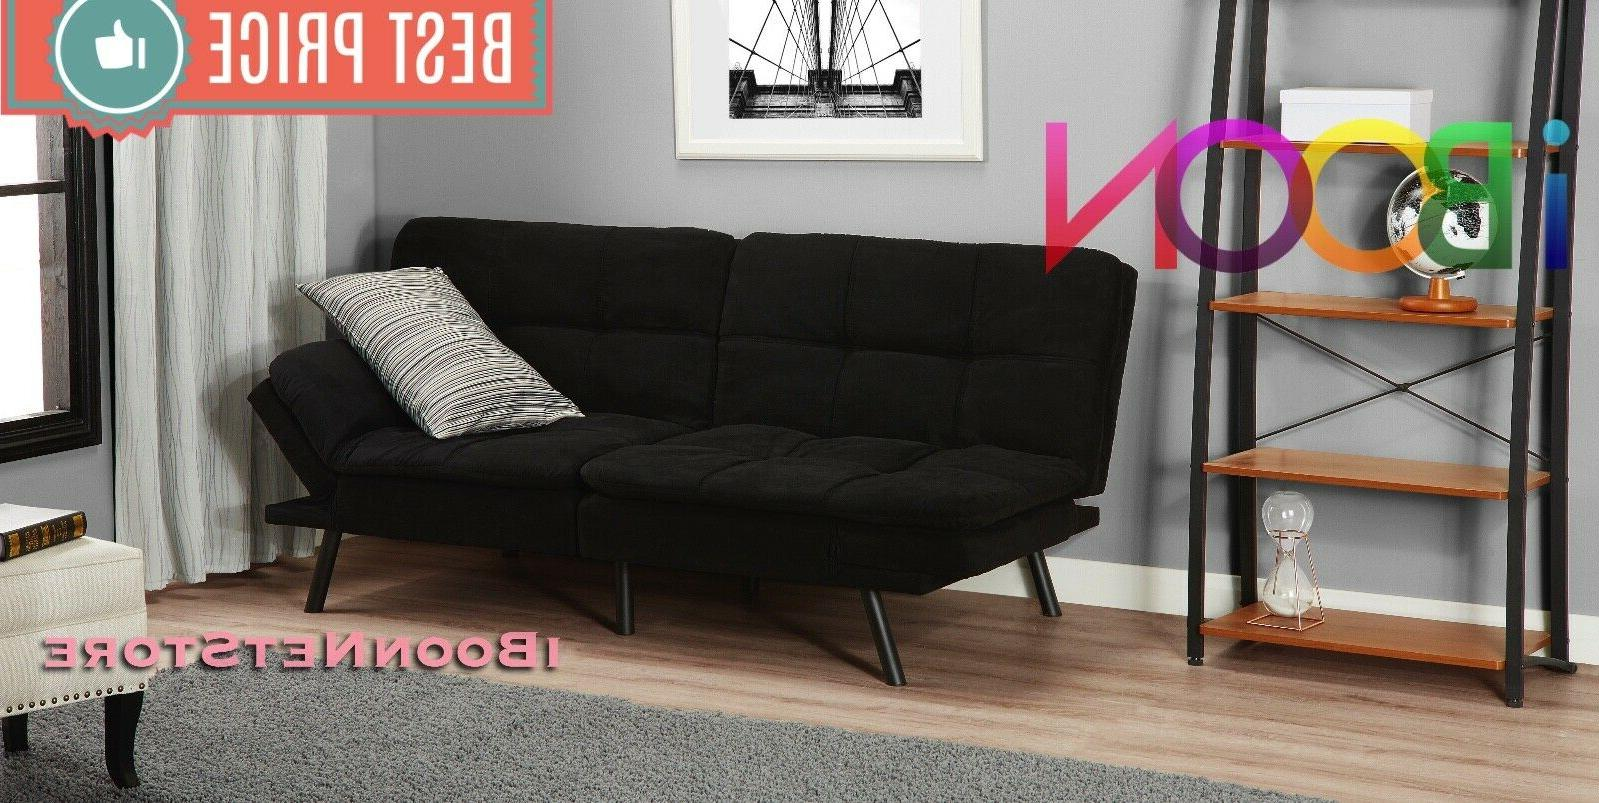 Memory Foam Sofa Bed Convertible Foldable Black FULL